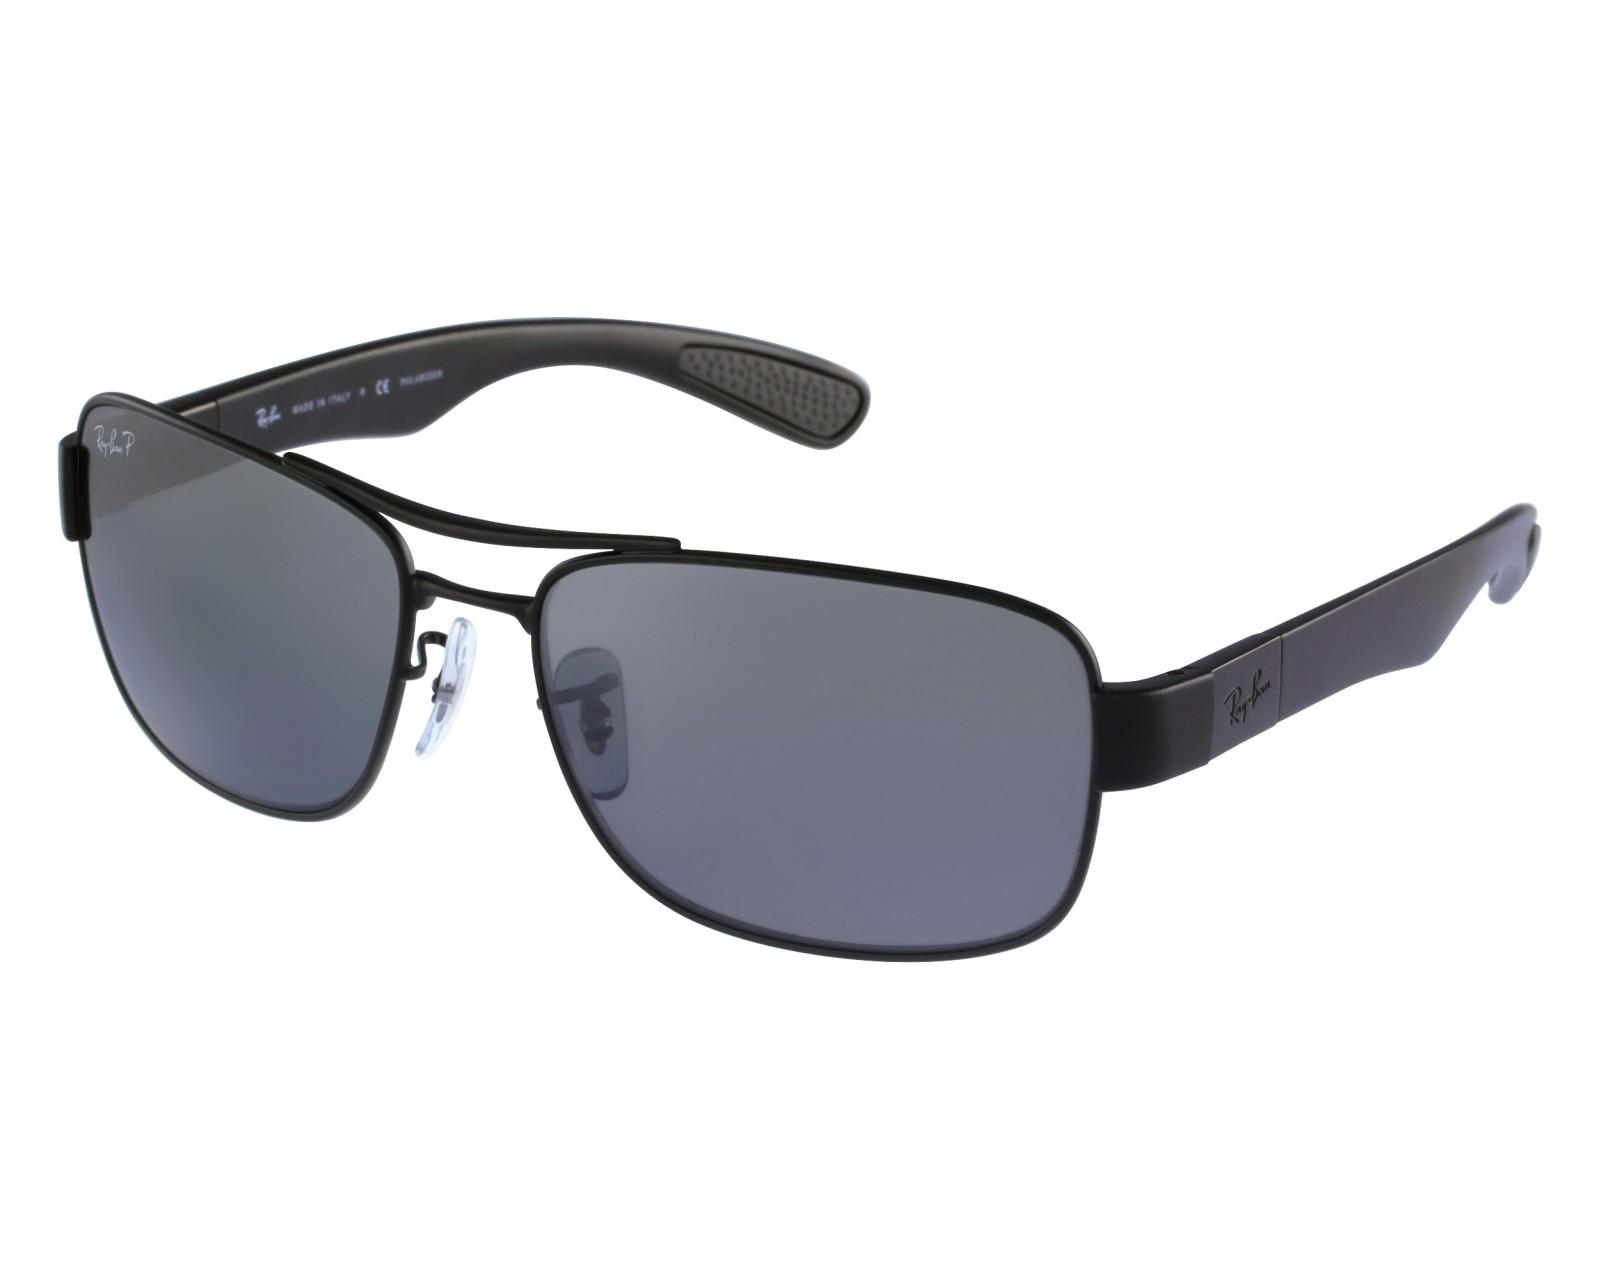 f354fdb5b70 Ray-Ban Sunglasses RB-3522 006 82